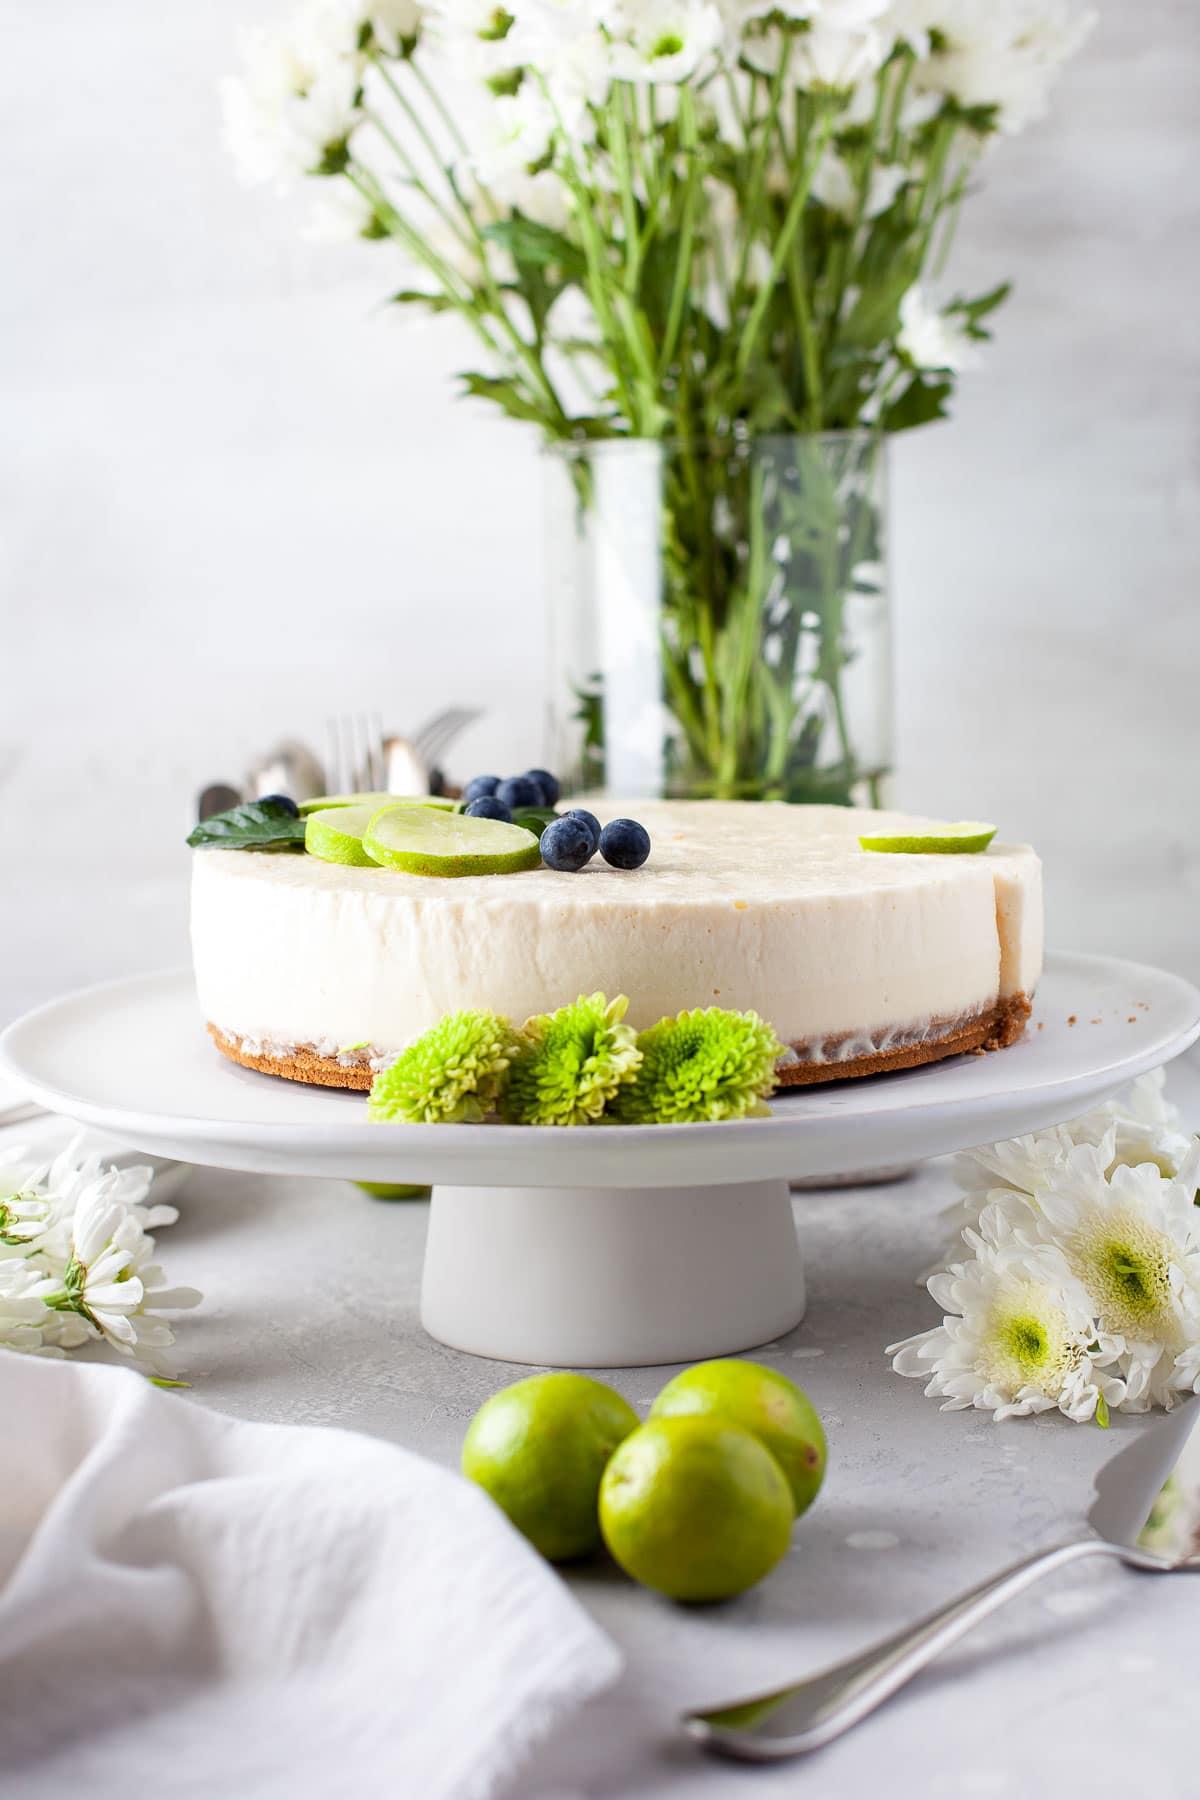 frozen key lime pie slice from side on plate